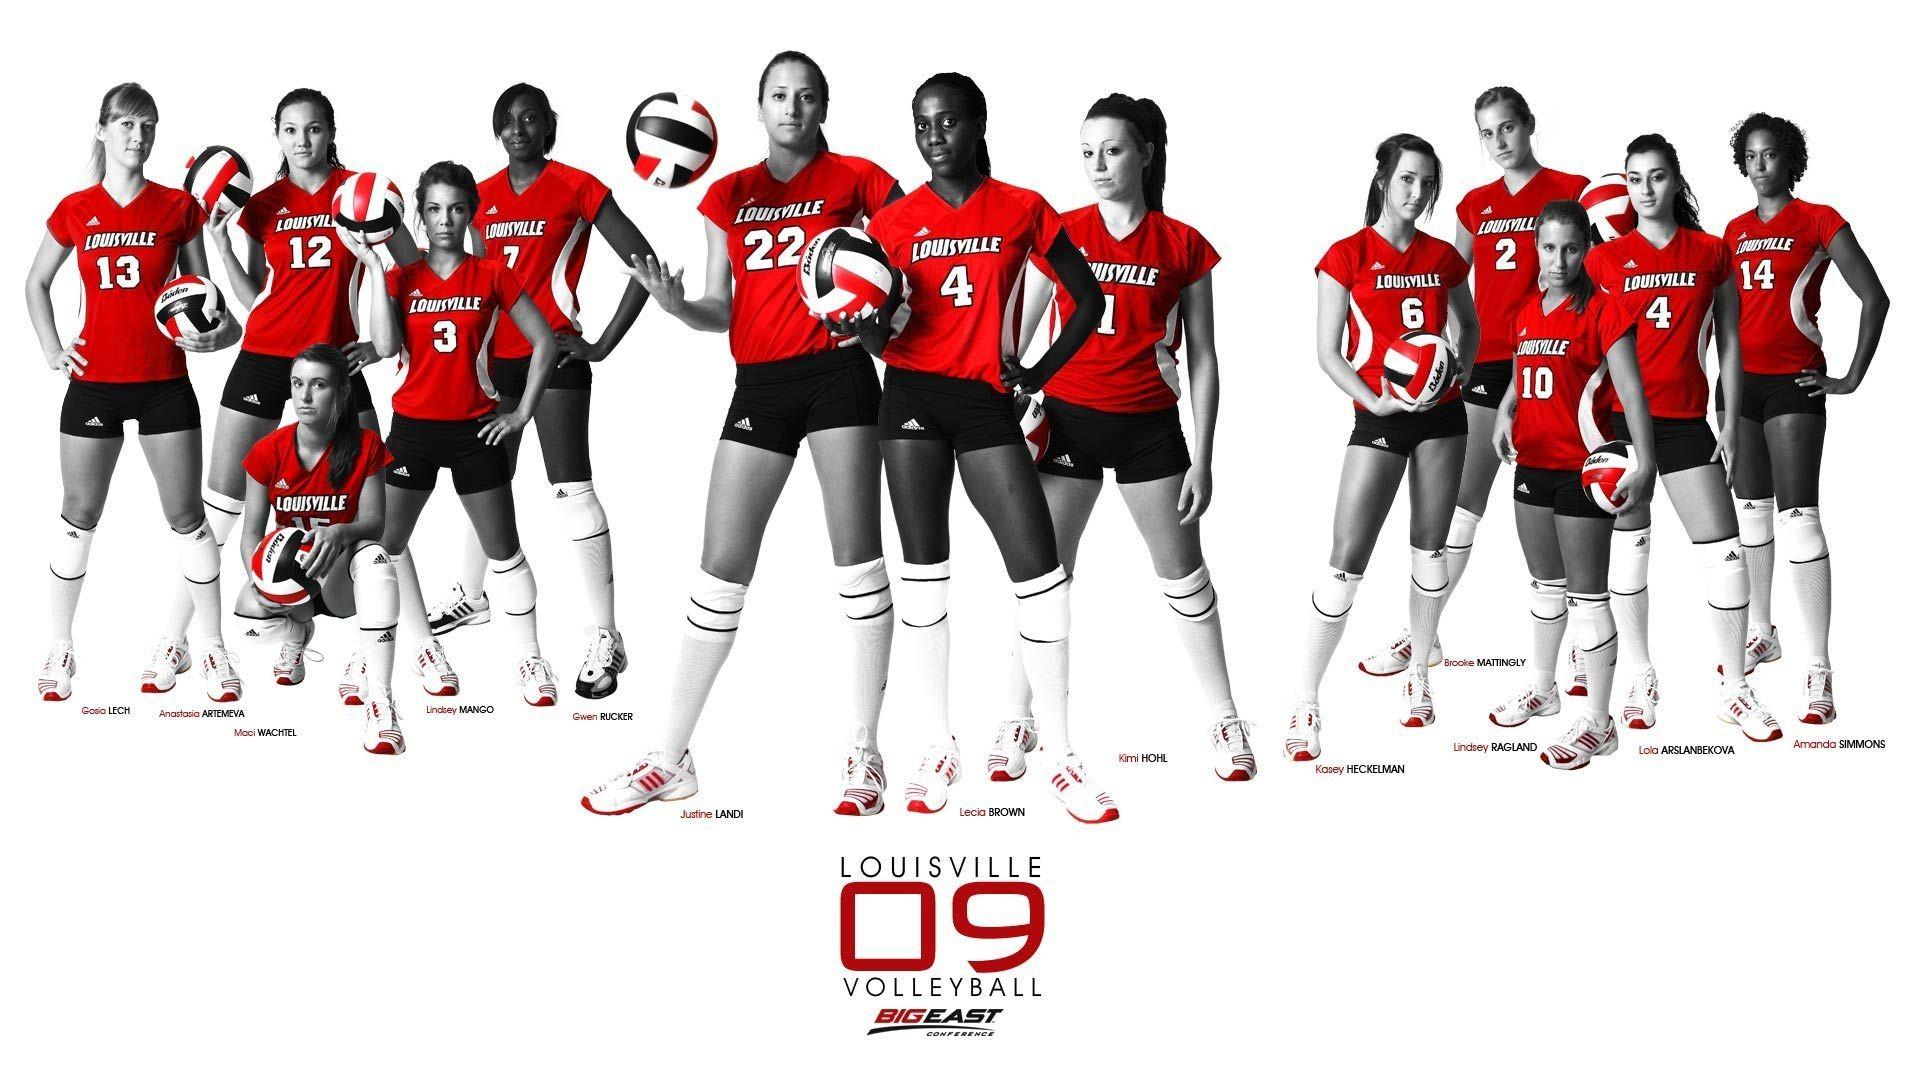 Volleyball college LOUISVILLE wallpaper | | 128558 | WallpaperUP